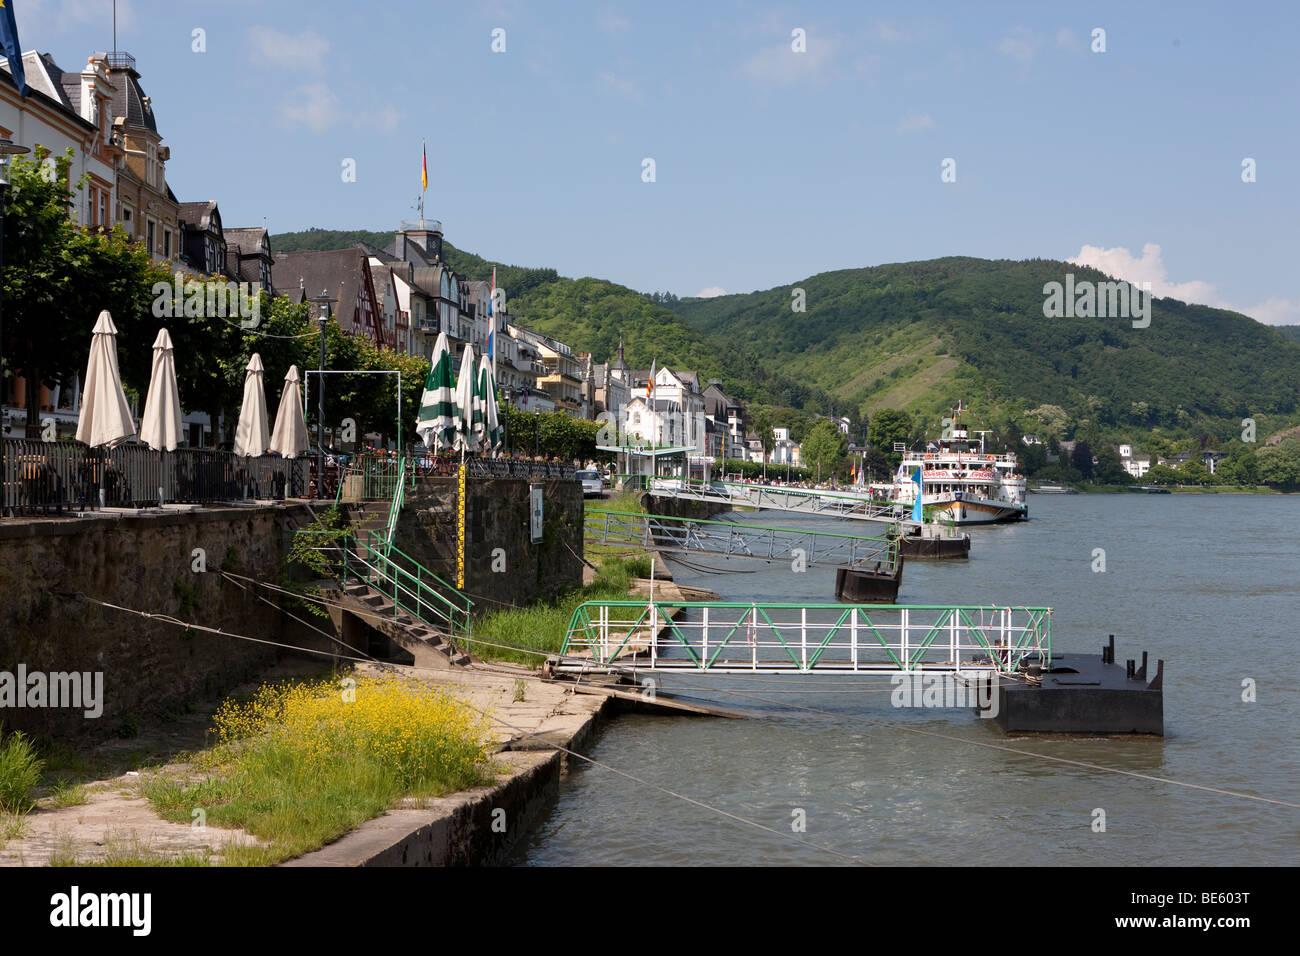 The Rheinallee street in Boppard with moorings for boats, Boppard, Rhein-Hunsrueck-Kreis district, Rhineland-Palatinate, - Stock Image